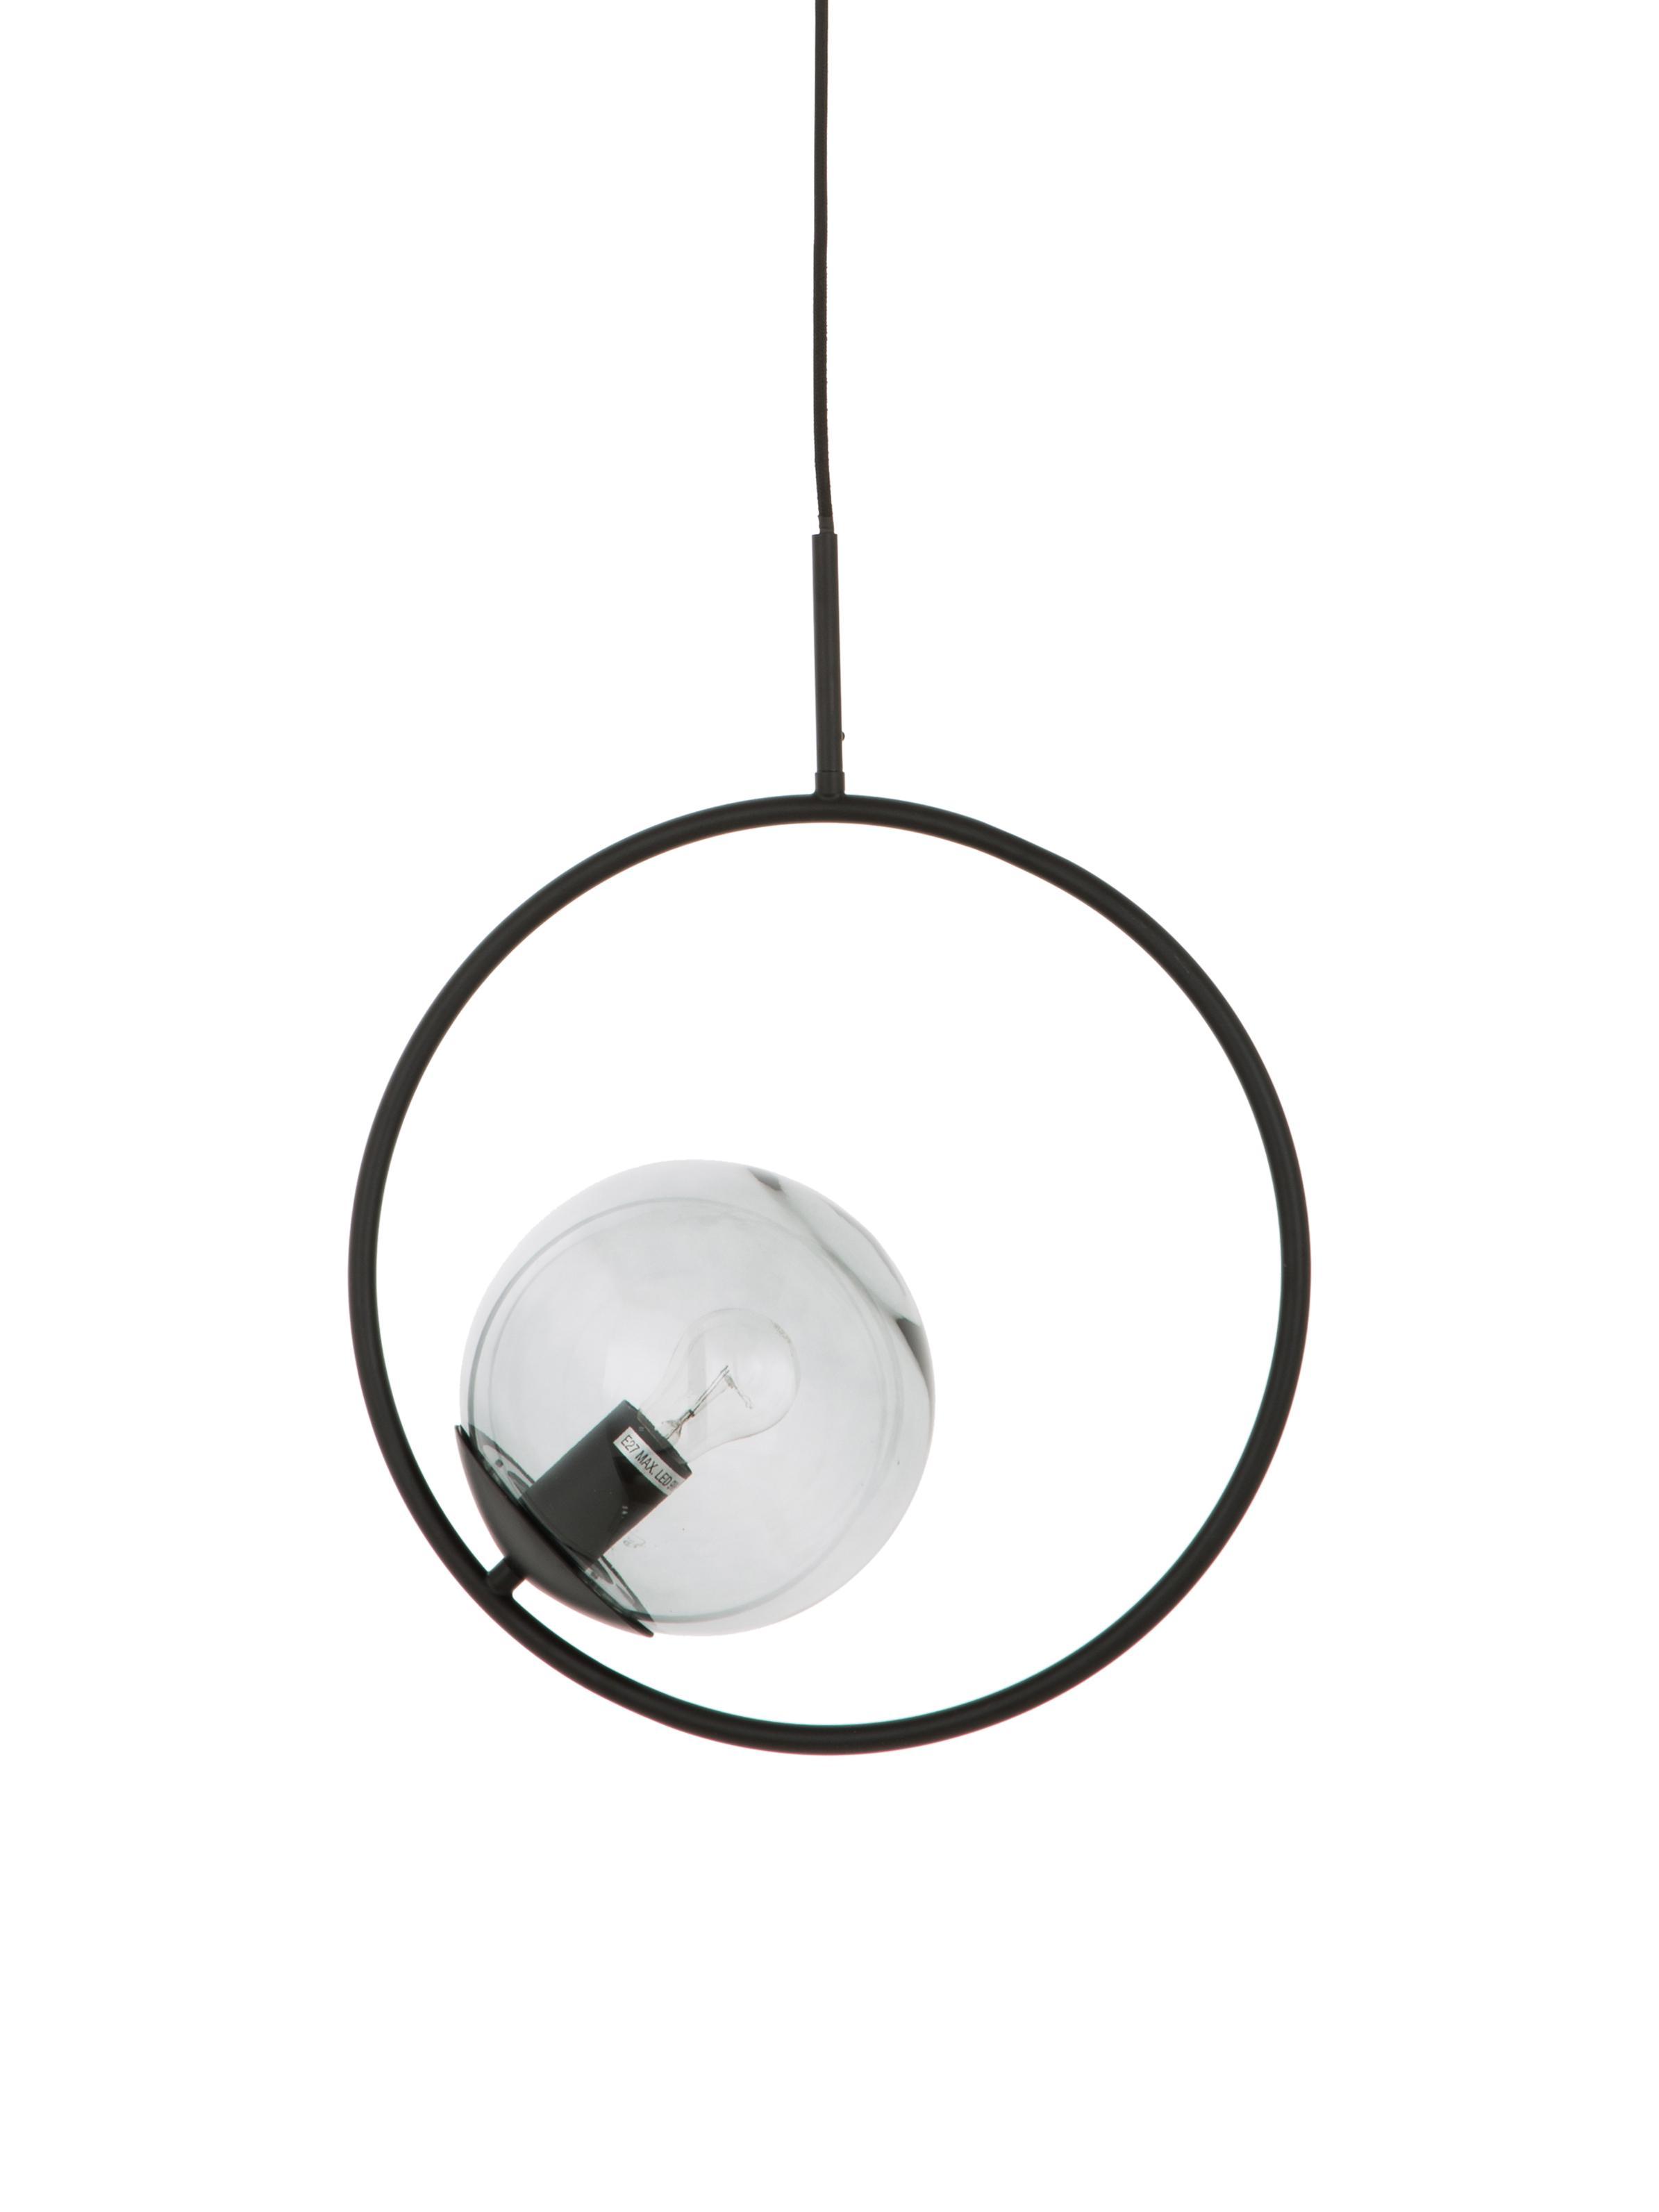 Lampada a sospensione in vetro e metallo Chloe, Paralume: vetro, Grigio, nero, Larg. 40 x Alt. 51 cm